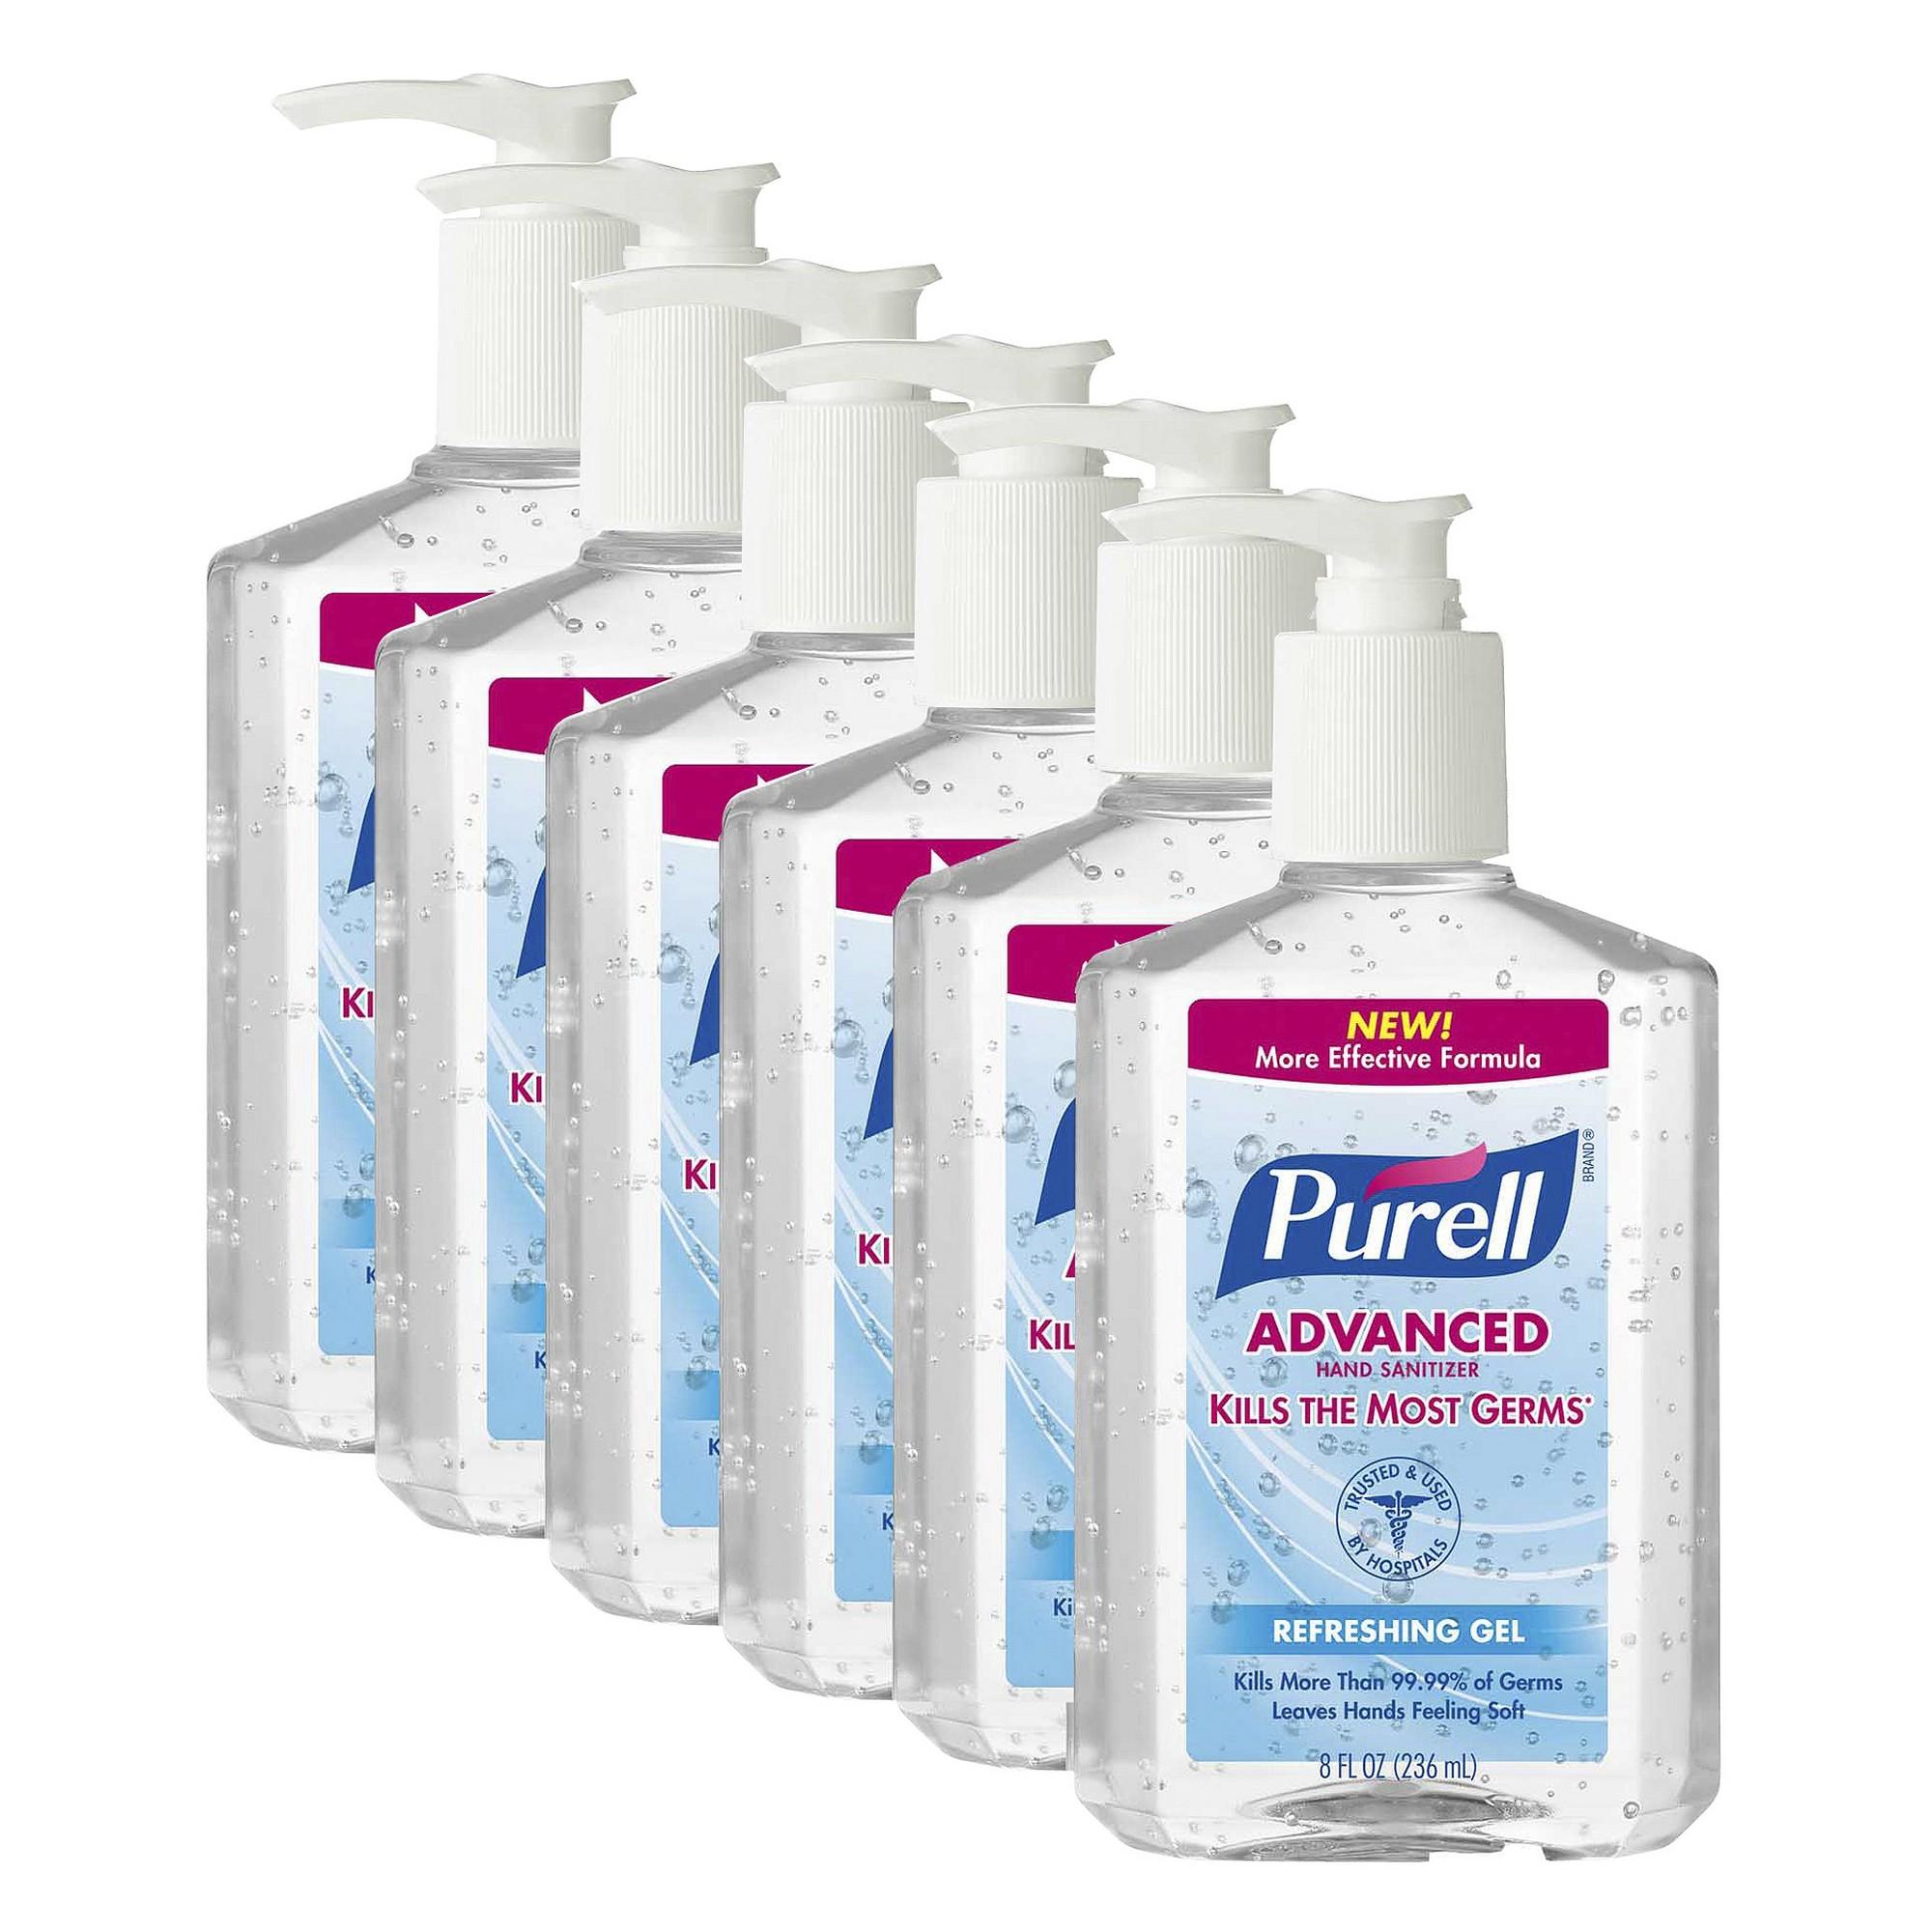 Purell Advanced Hand Sanitizer Refereshing Gel 8oz/6pk